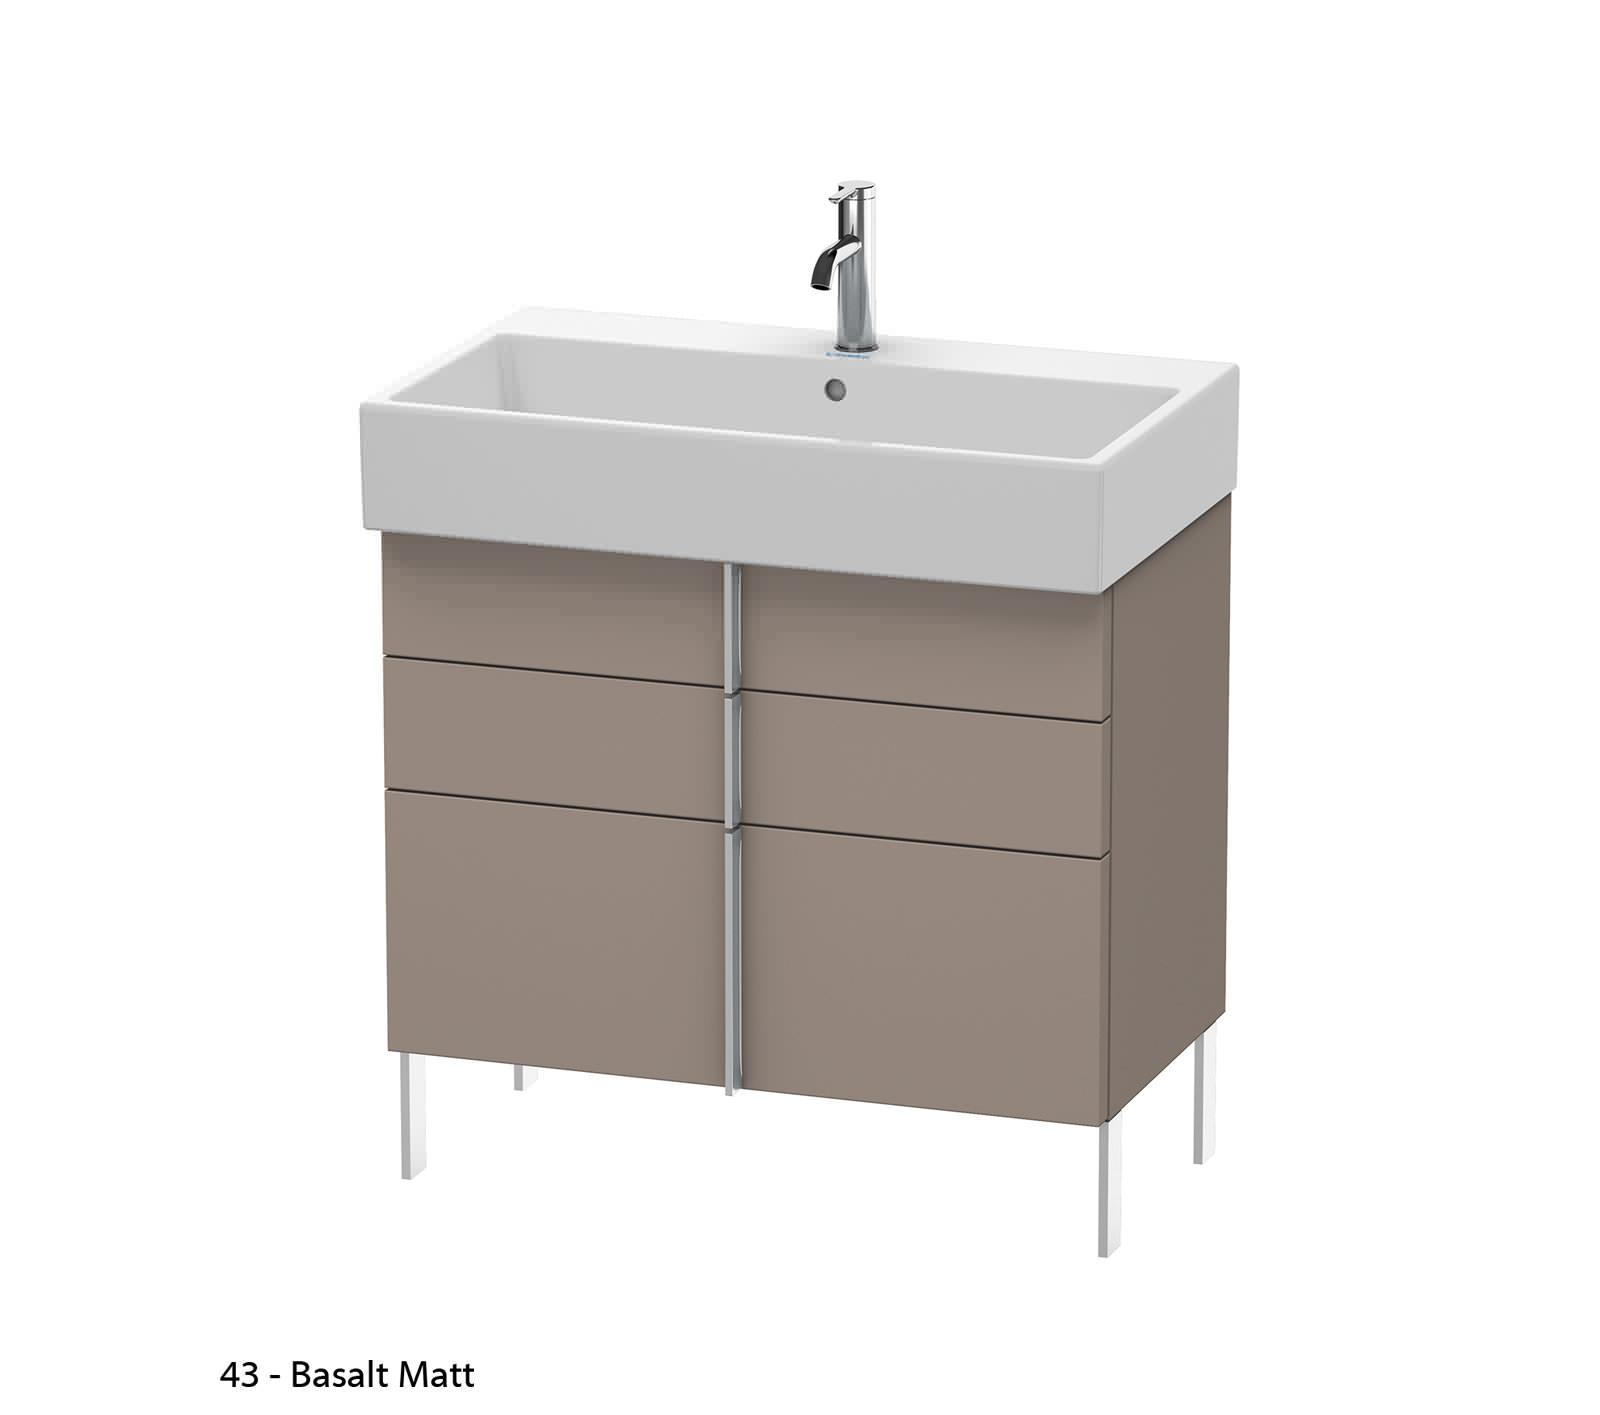 Duravit vero air 784 x 431mm 2 drawer floor standing unit - Duravit bathroom furniture uk ...